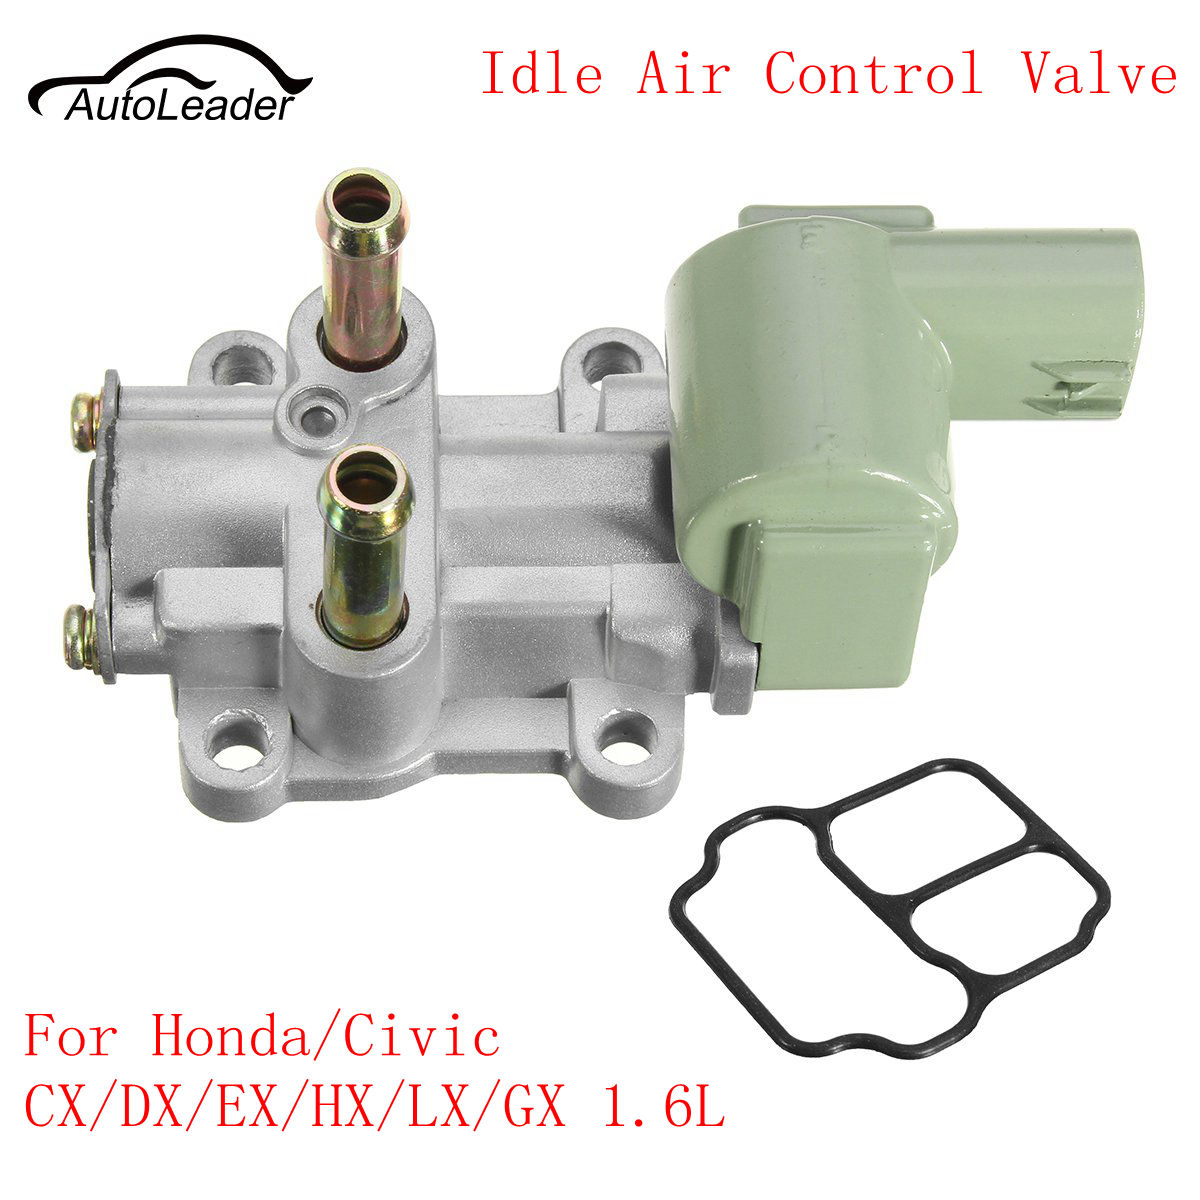 Idle Air Control Valve IACV IAC For Honda For Civic CX DX EX HX LX GX 1.6L SOHC MOTO